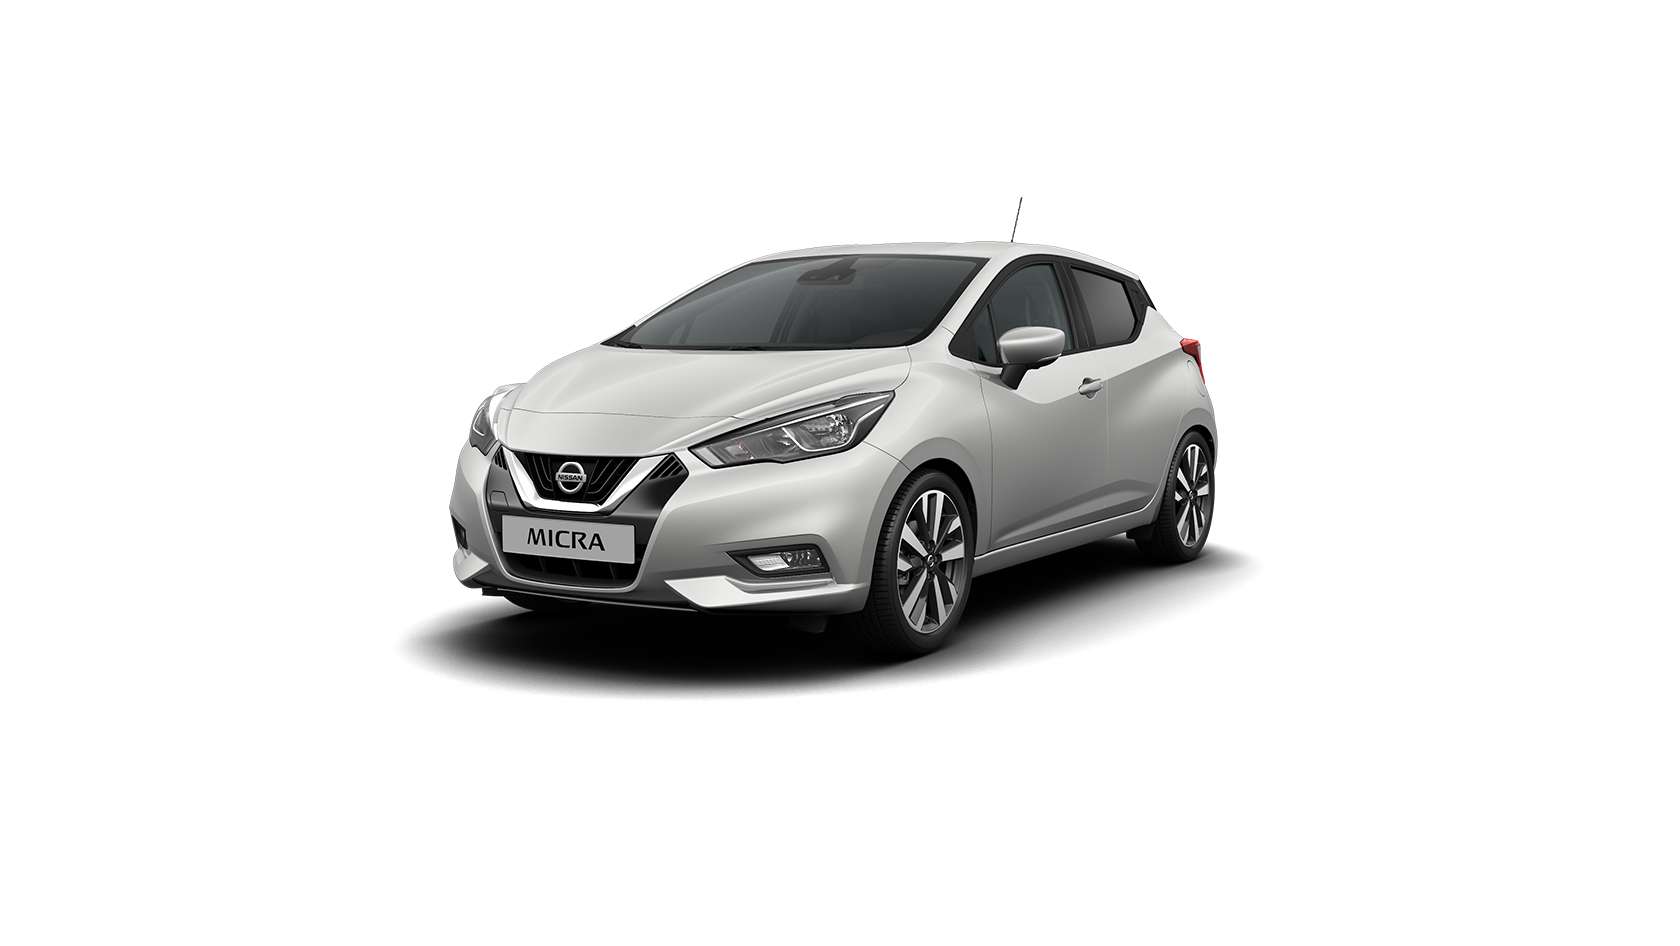 Nissan Micra Autozentrum P&A-Preckel